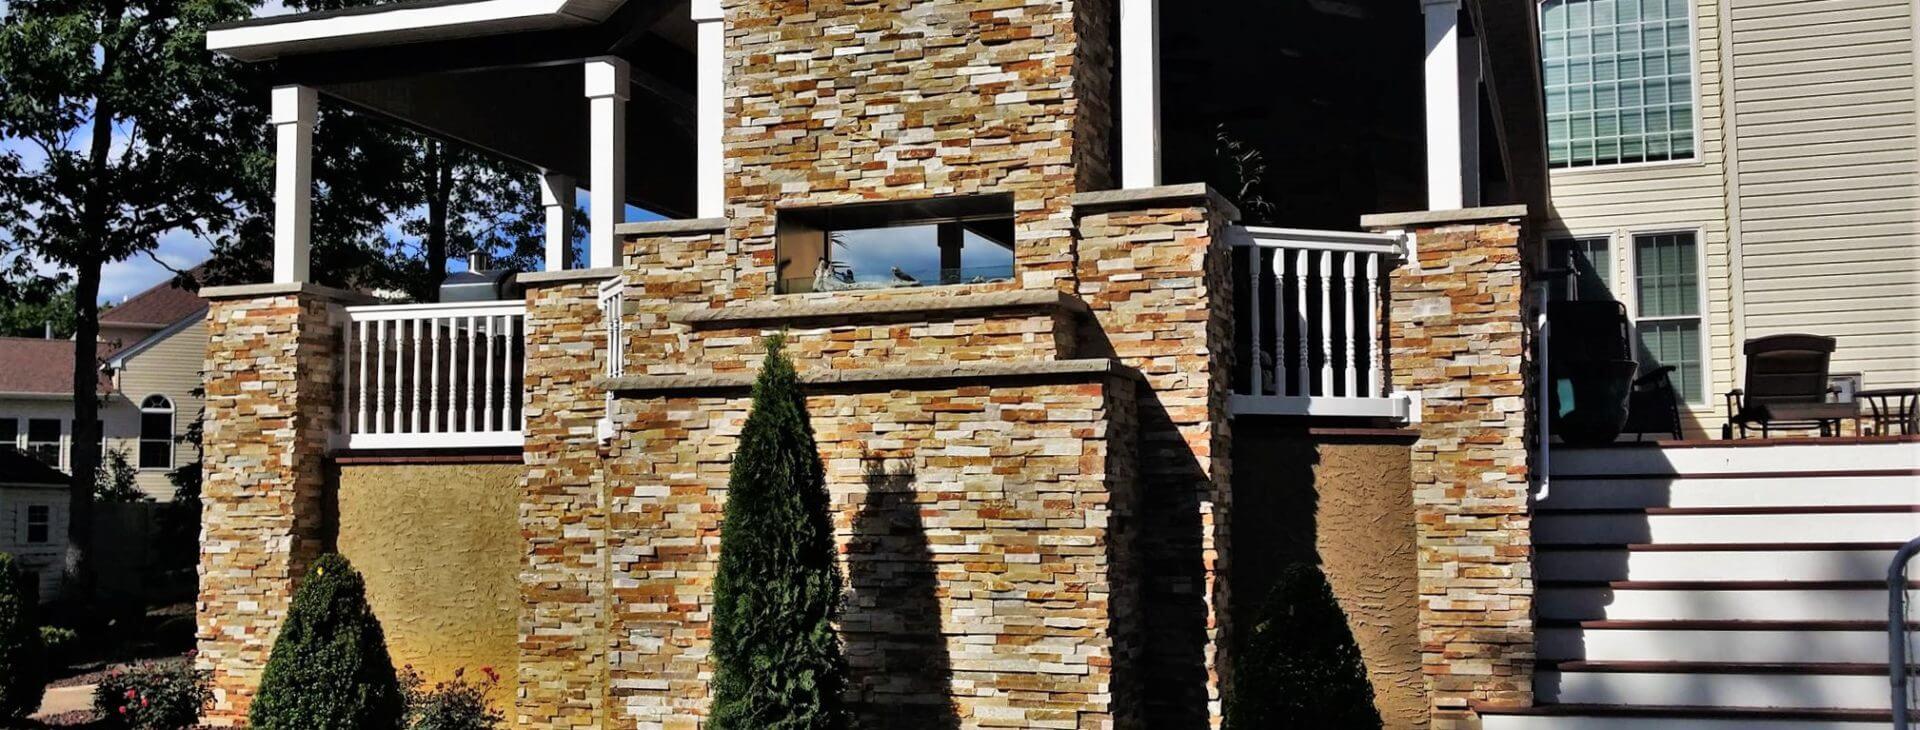 Custom Composite Decks & Stone Veneers